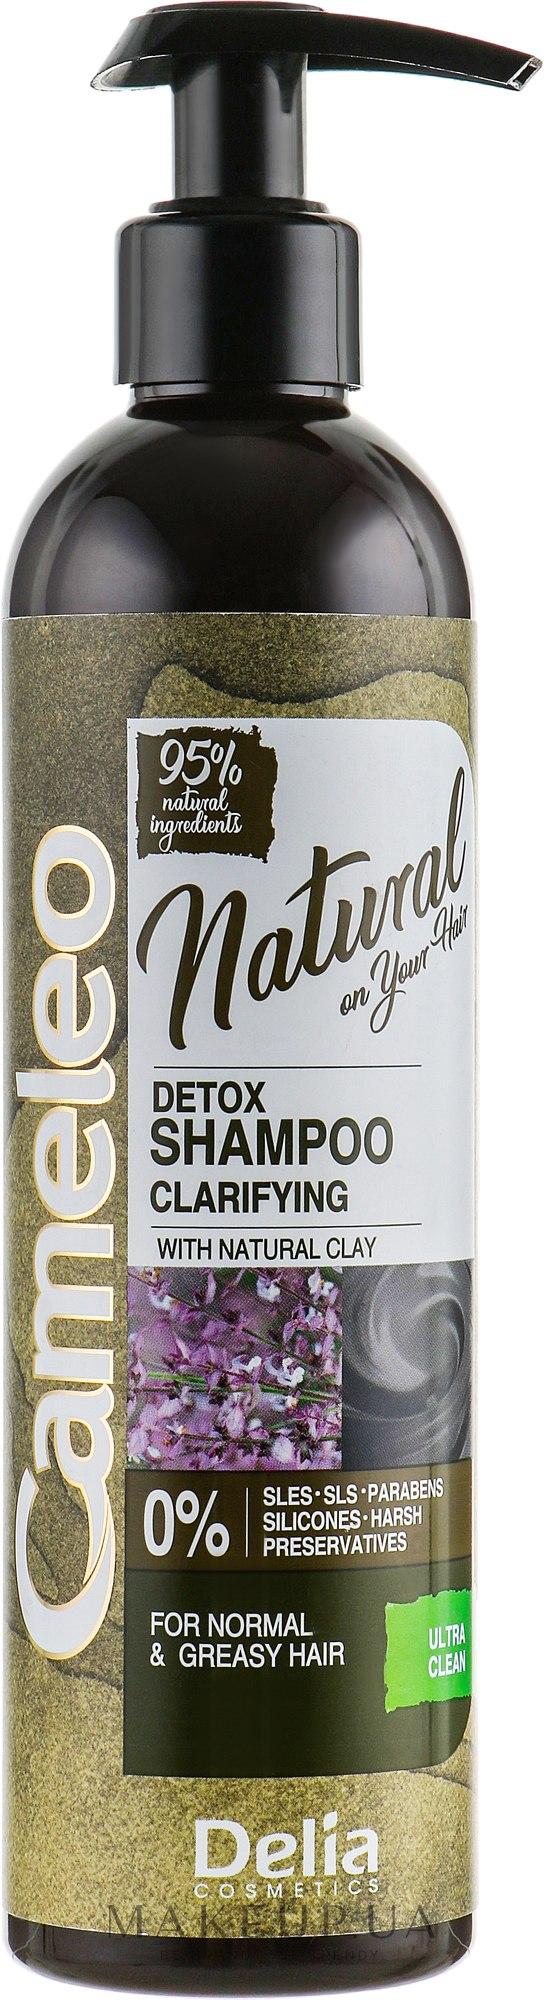 Шампунь для волос - Delia Cameleo Natural On Your Hair Detox Shampoo — фото 250ml